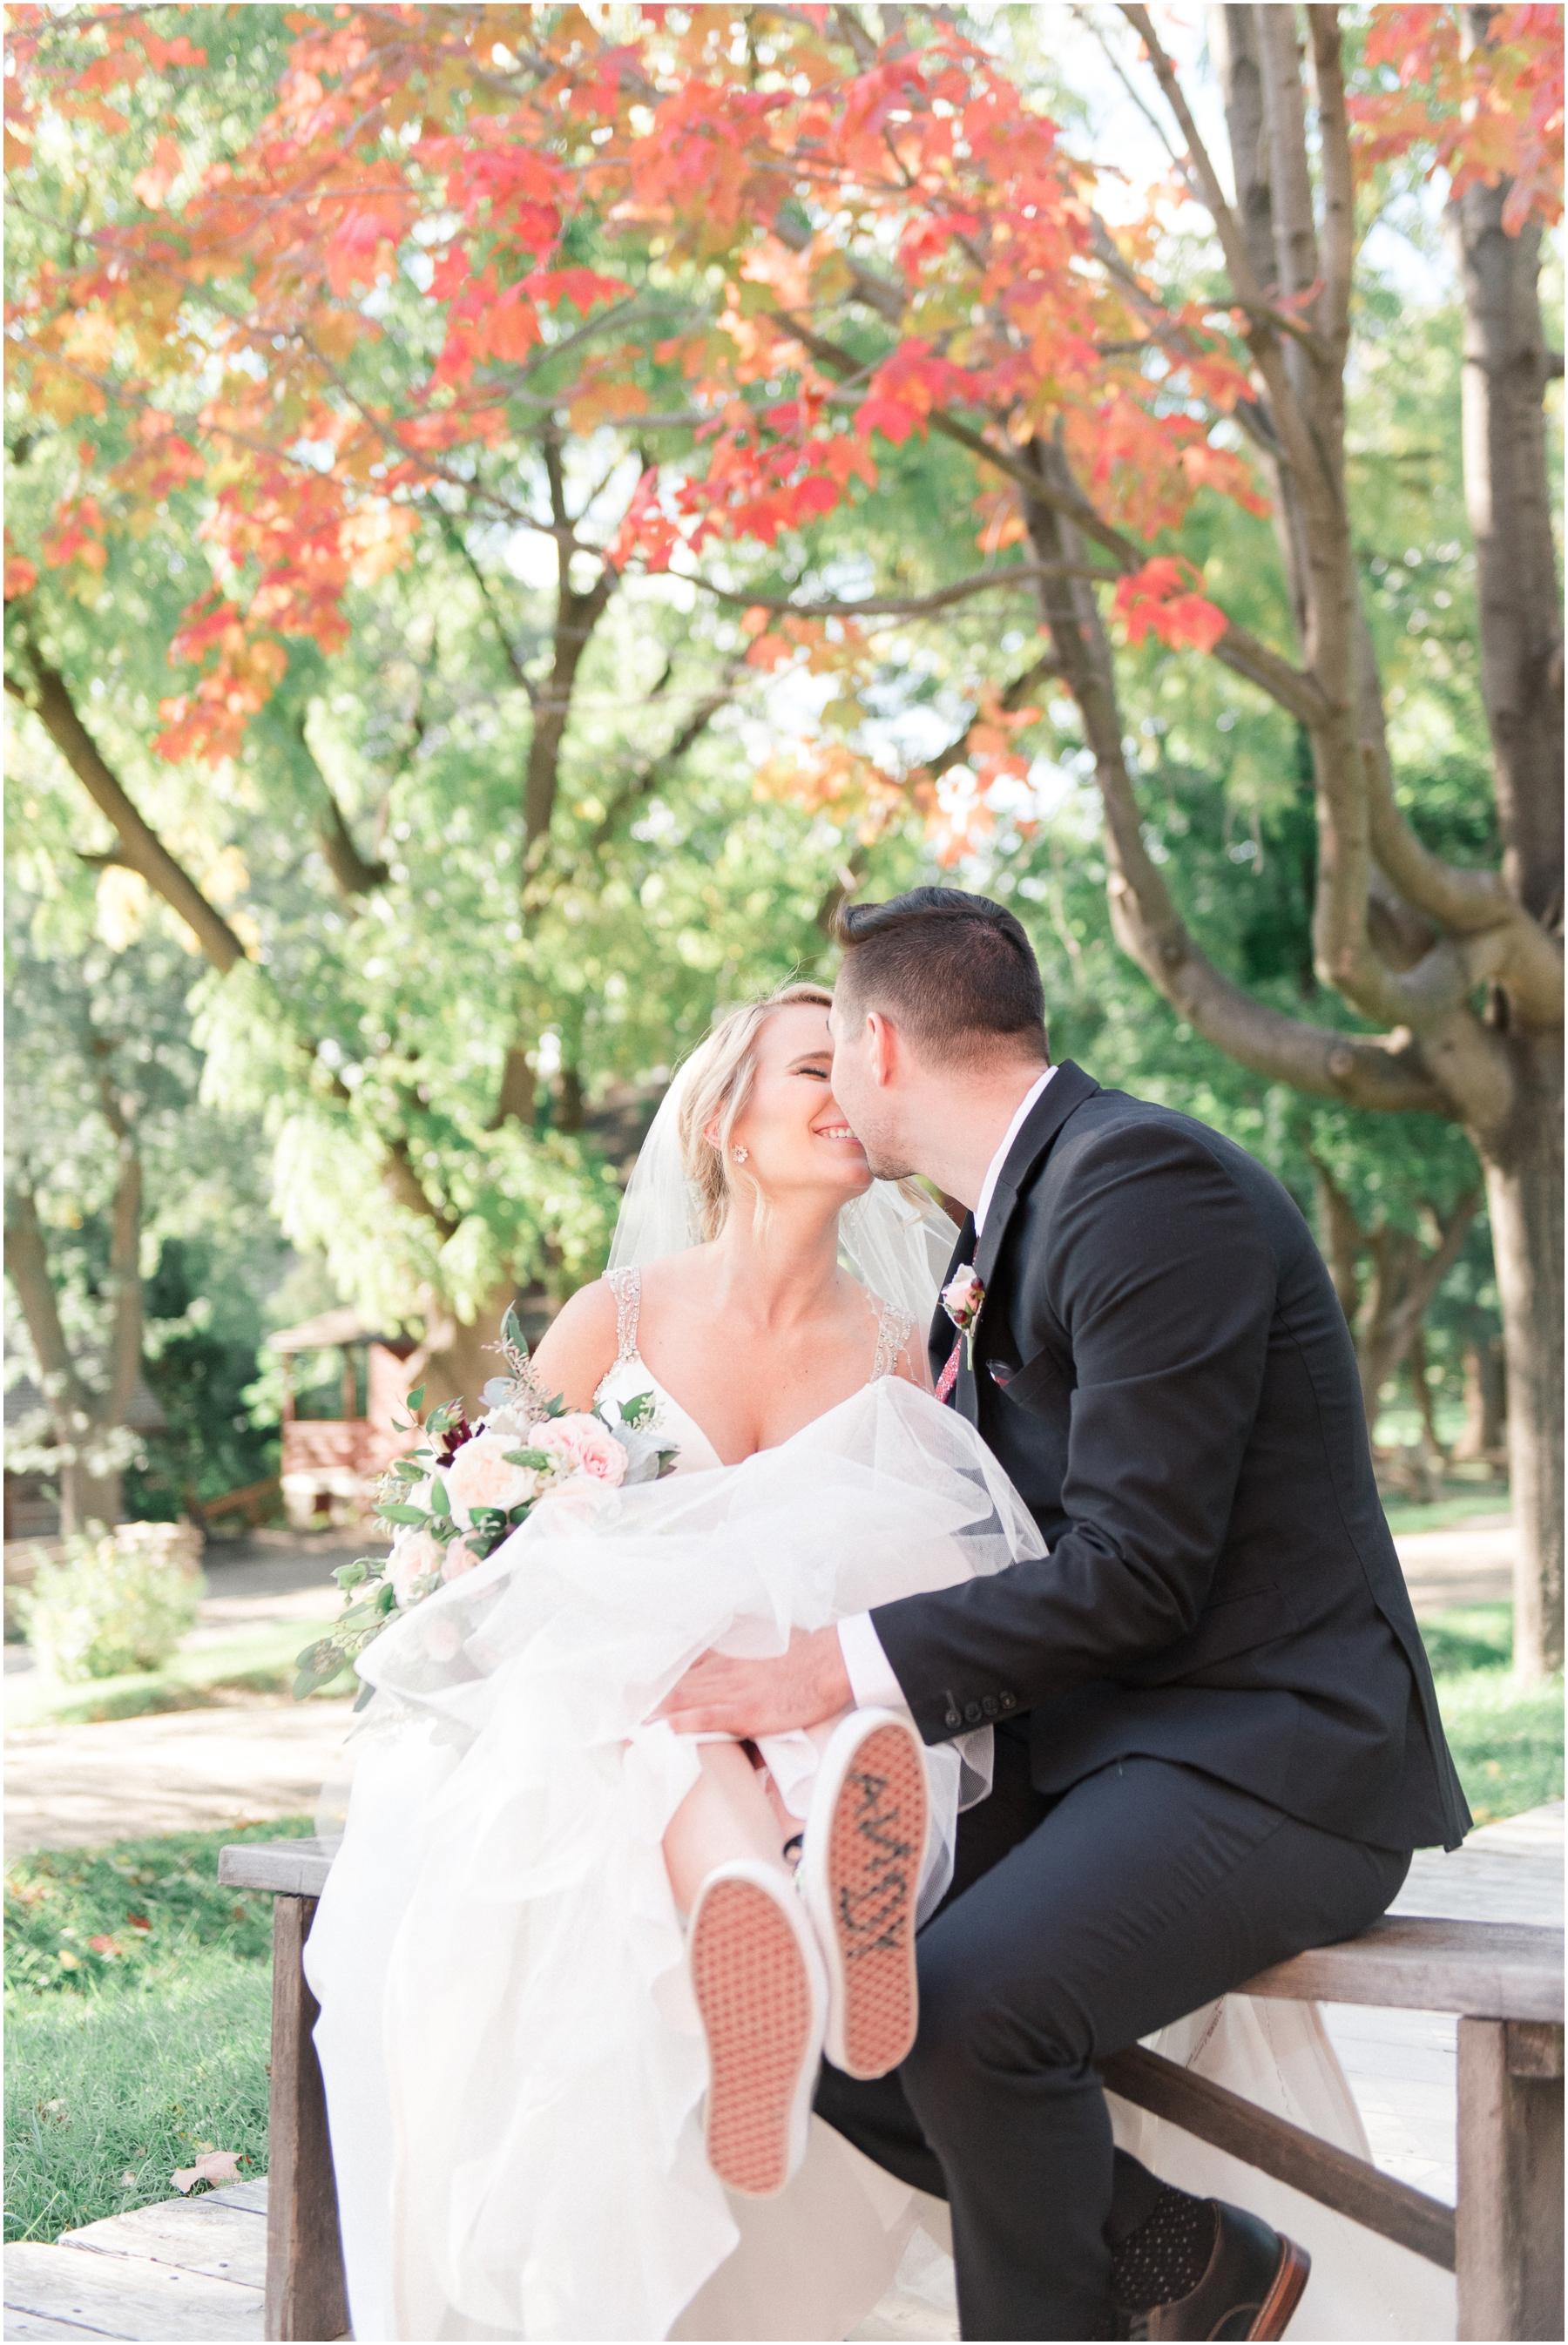 Black Creek Pioneer Village, Toronto Wedding- Precious Photography by Courtney McIntosh Becky & Andy_0165